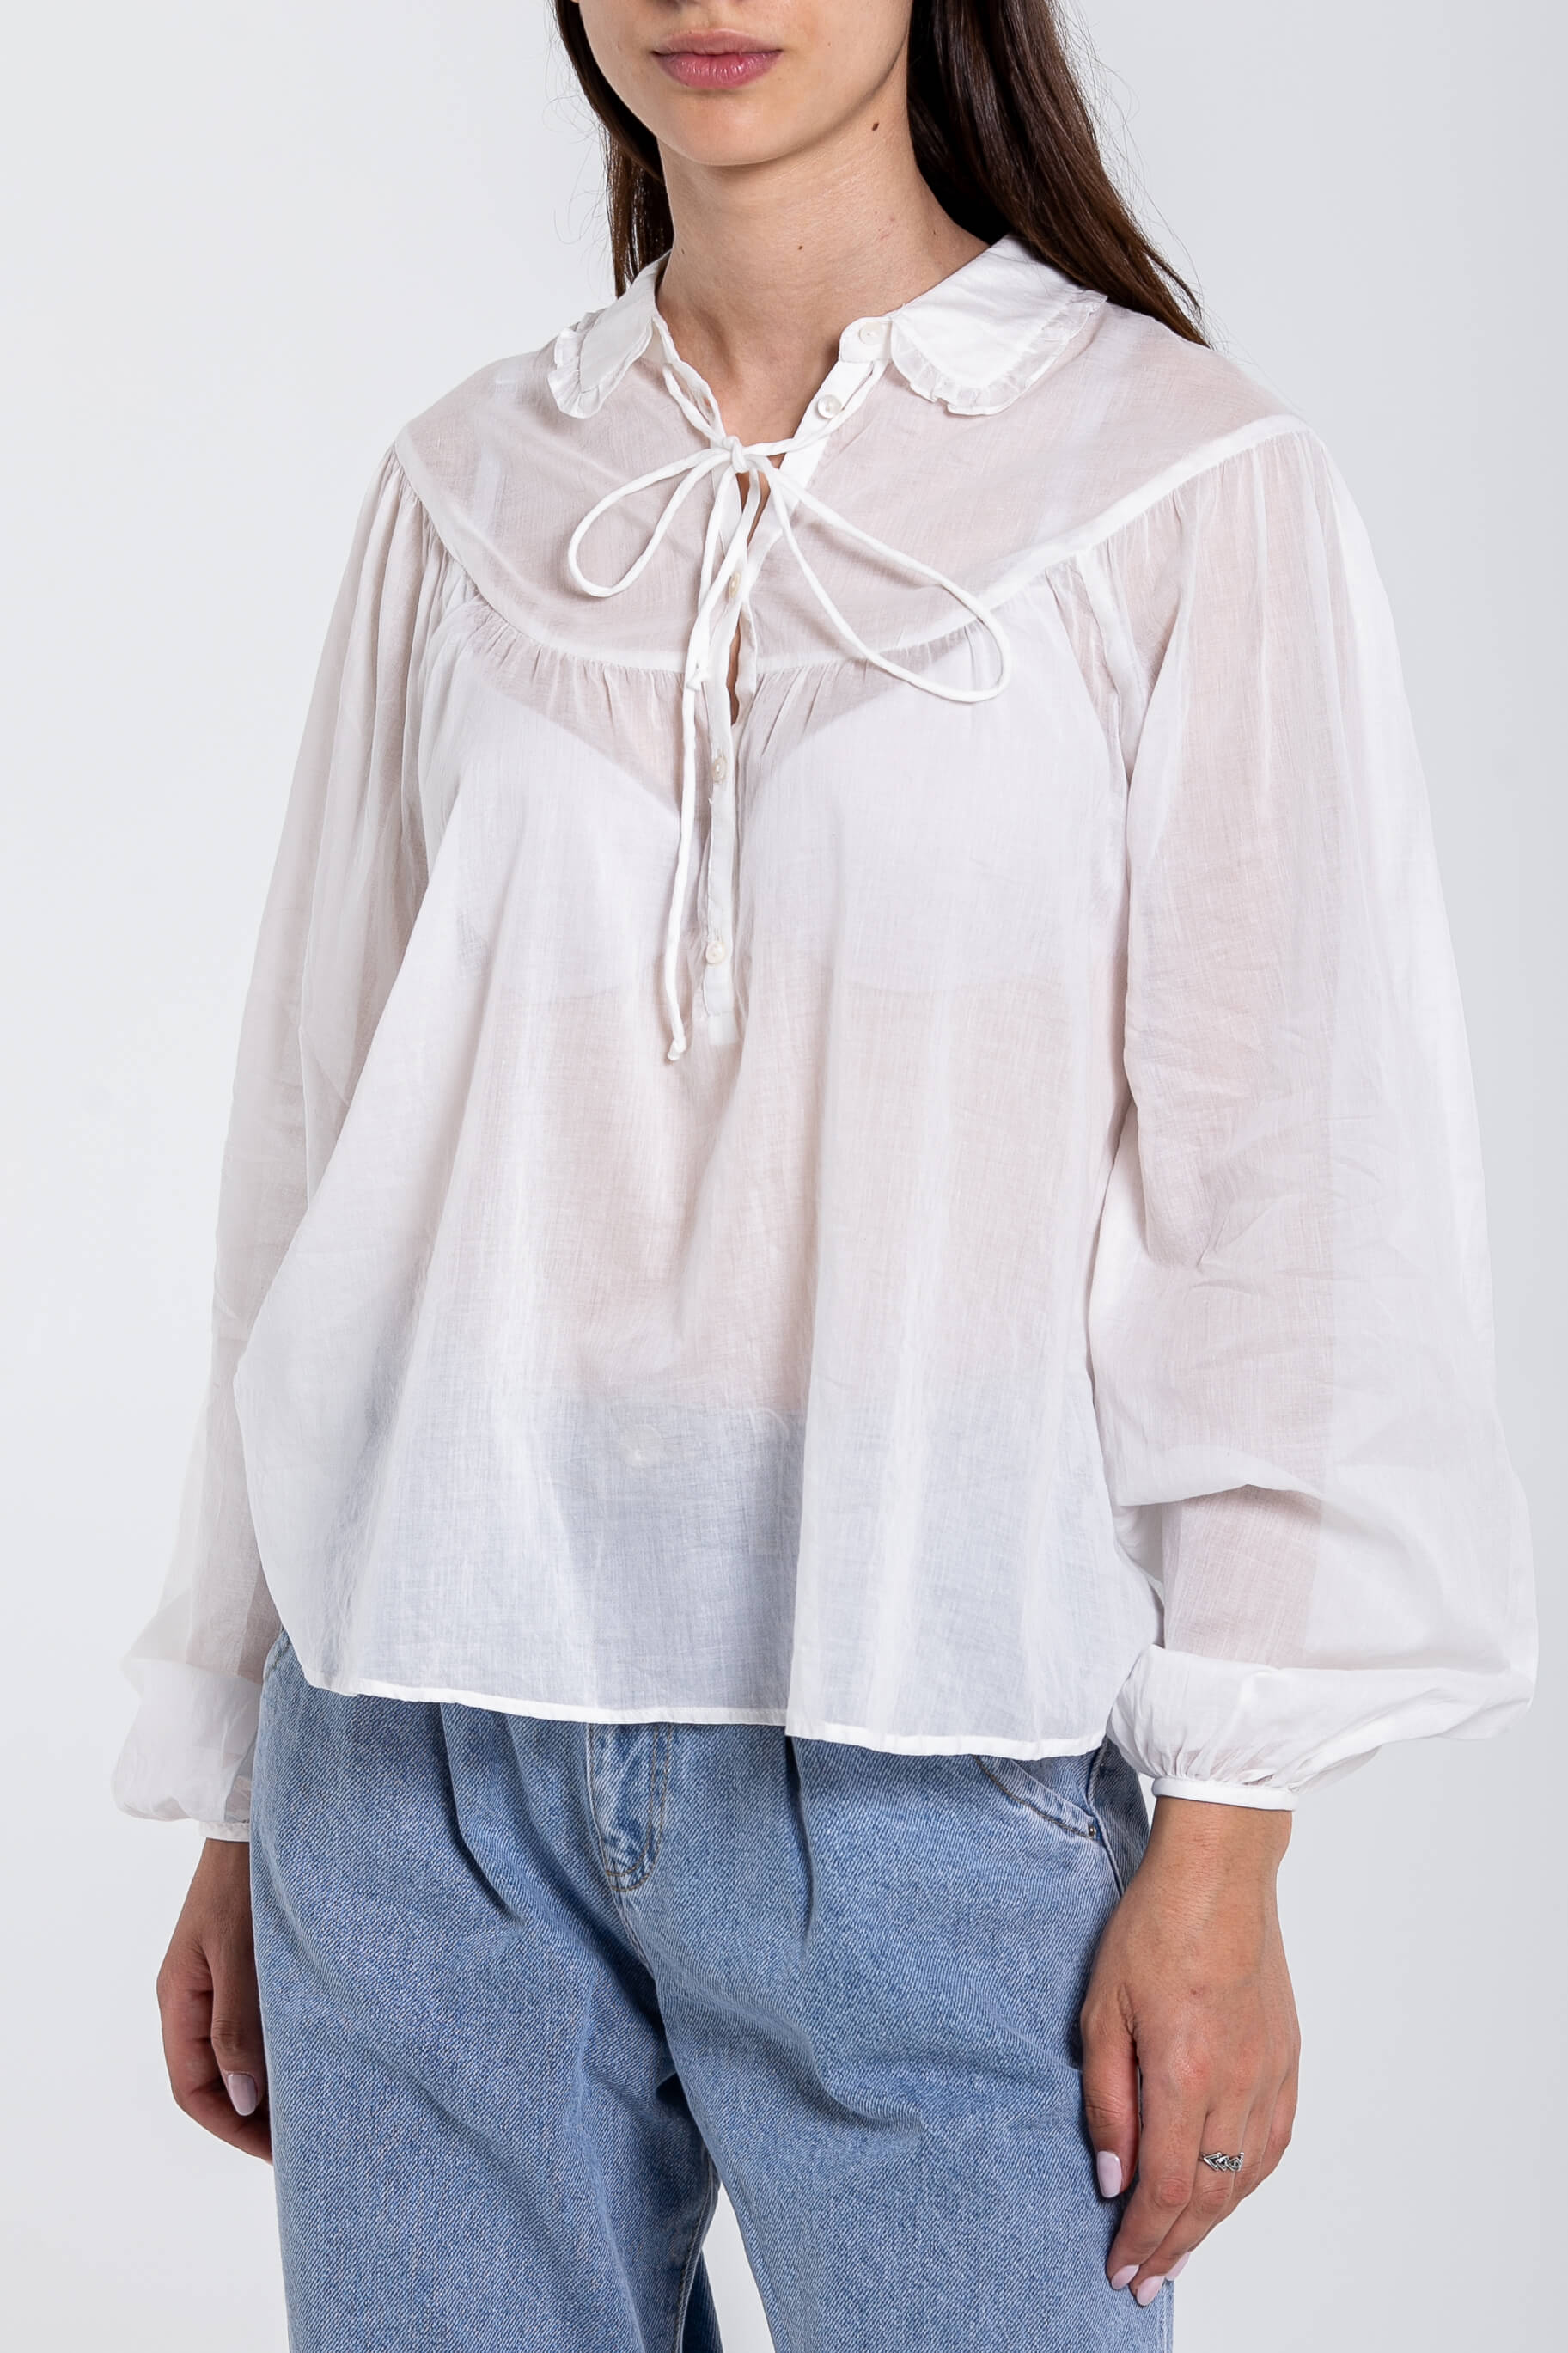 Блузка Richa Fashion Casual (1315) photo